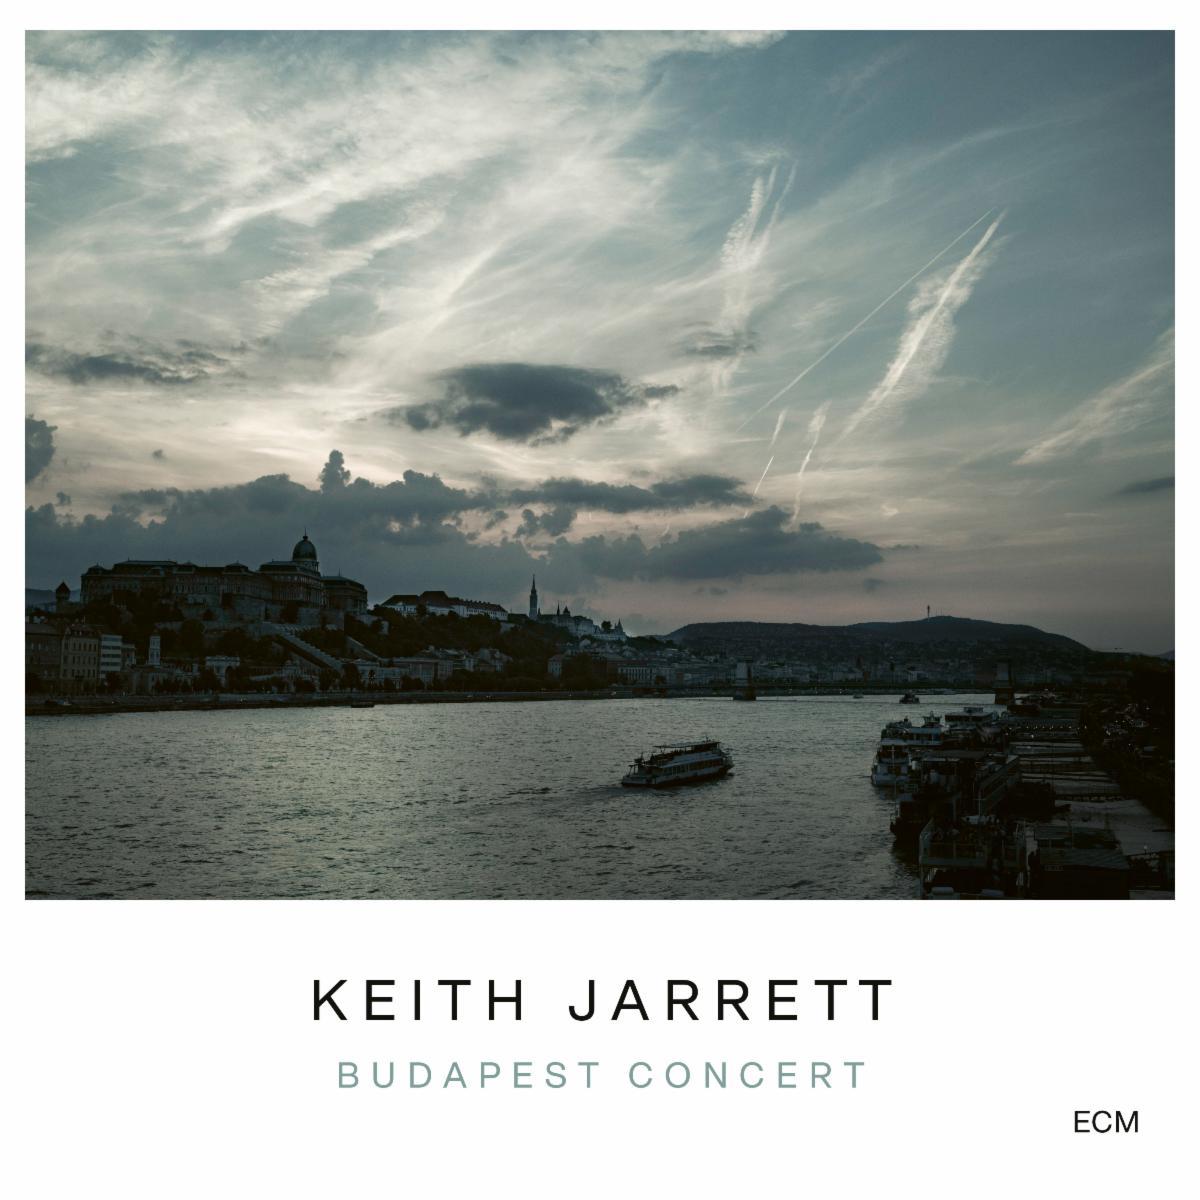 Keith Jarrett: Budapest Concert (ECM) - JazzTimes